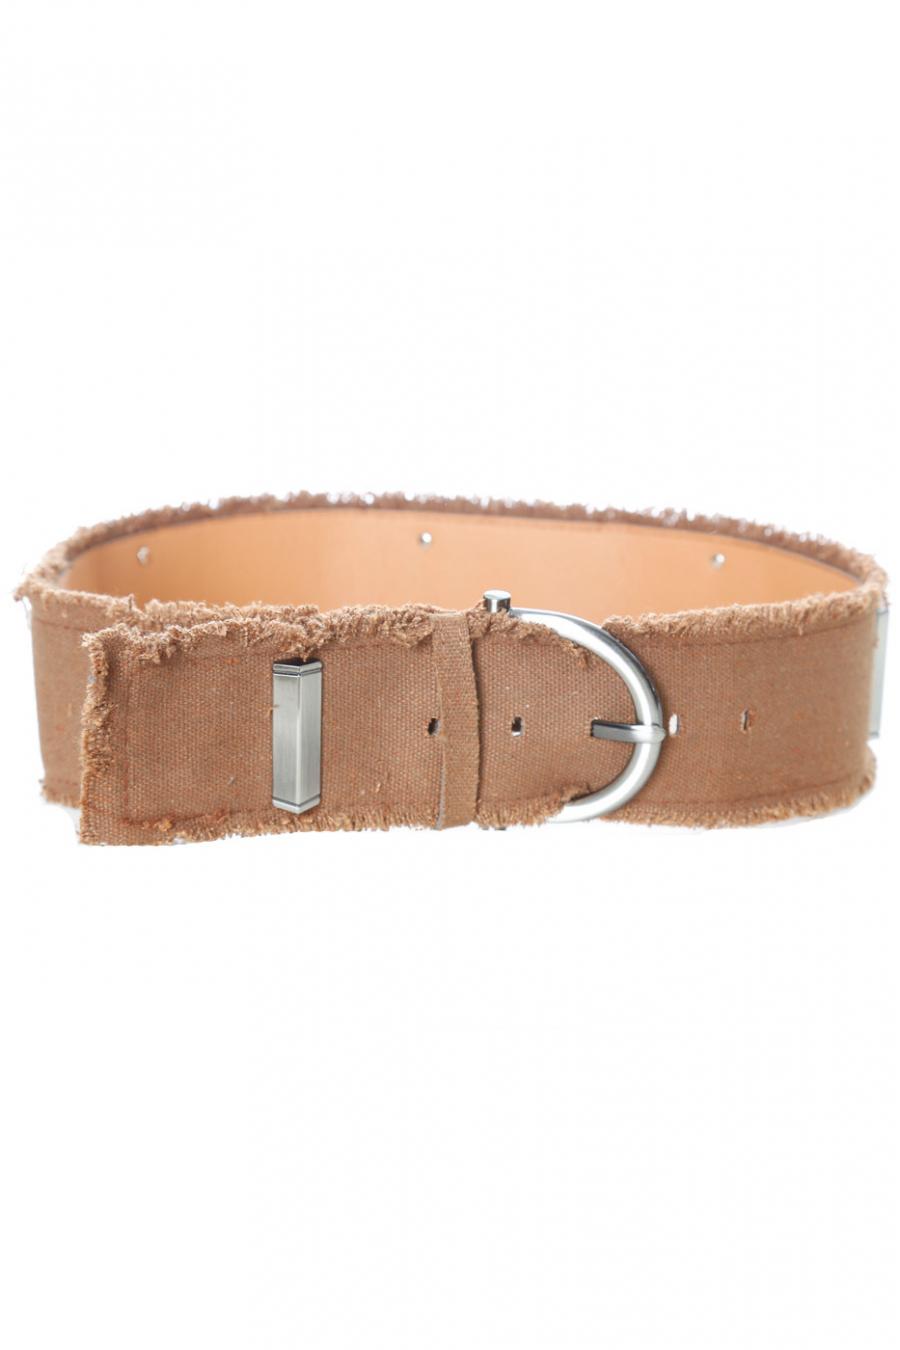 Camel denim-effect belt with rectangle studs. SG-0907